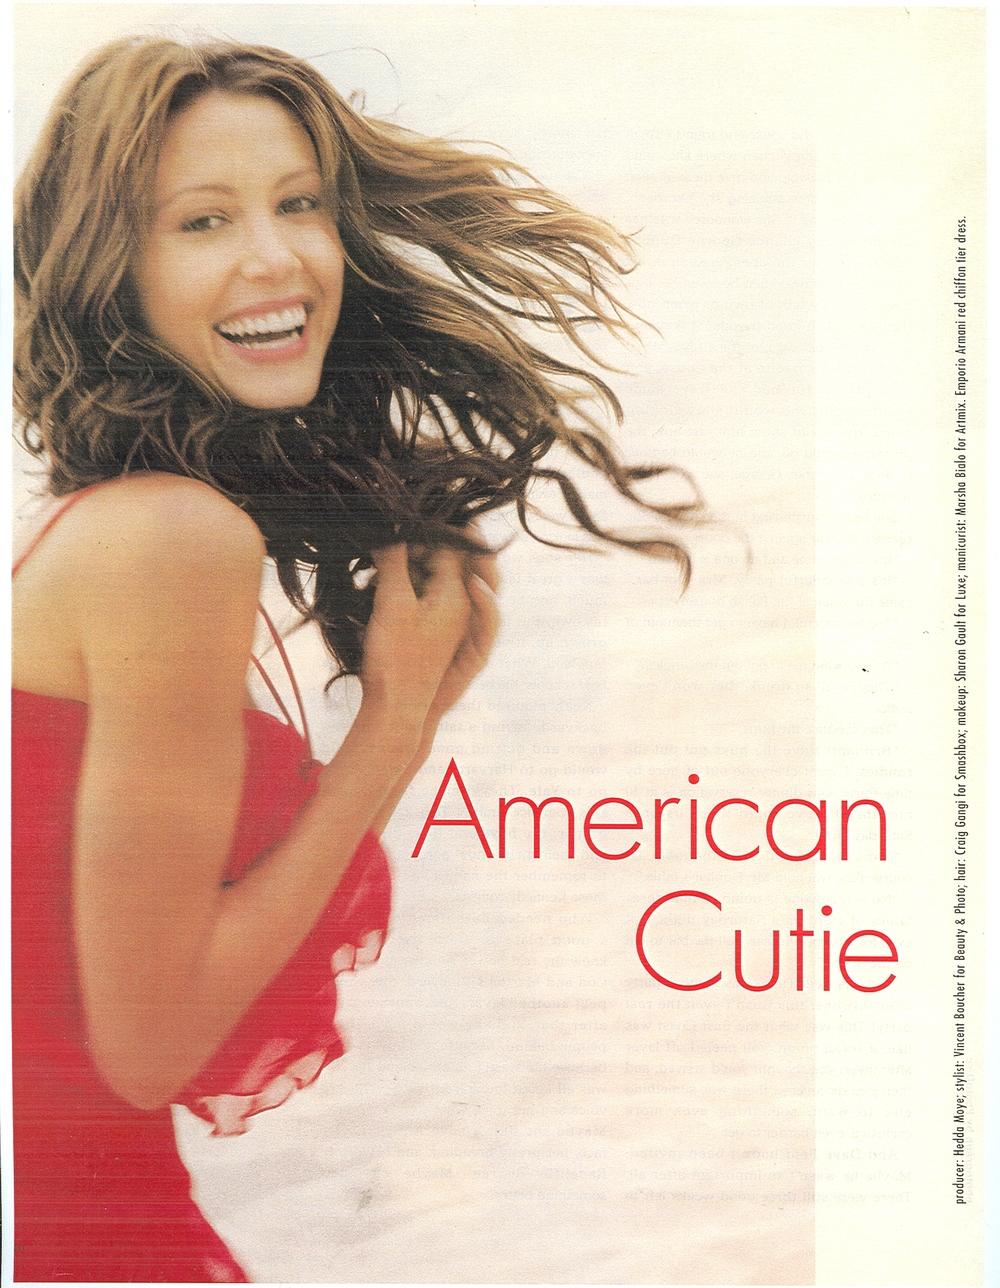 SE_Hamptons Magazine_2001_2.jpg